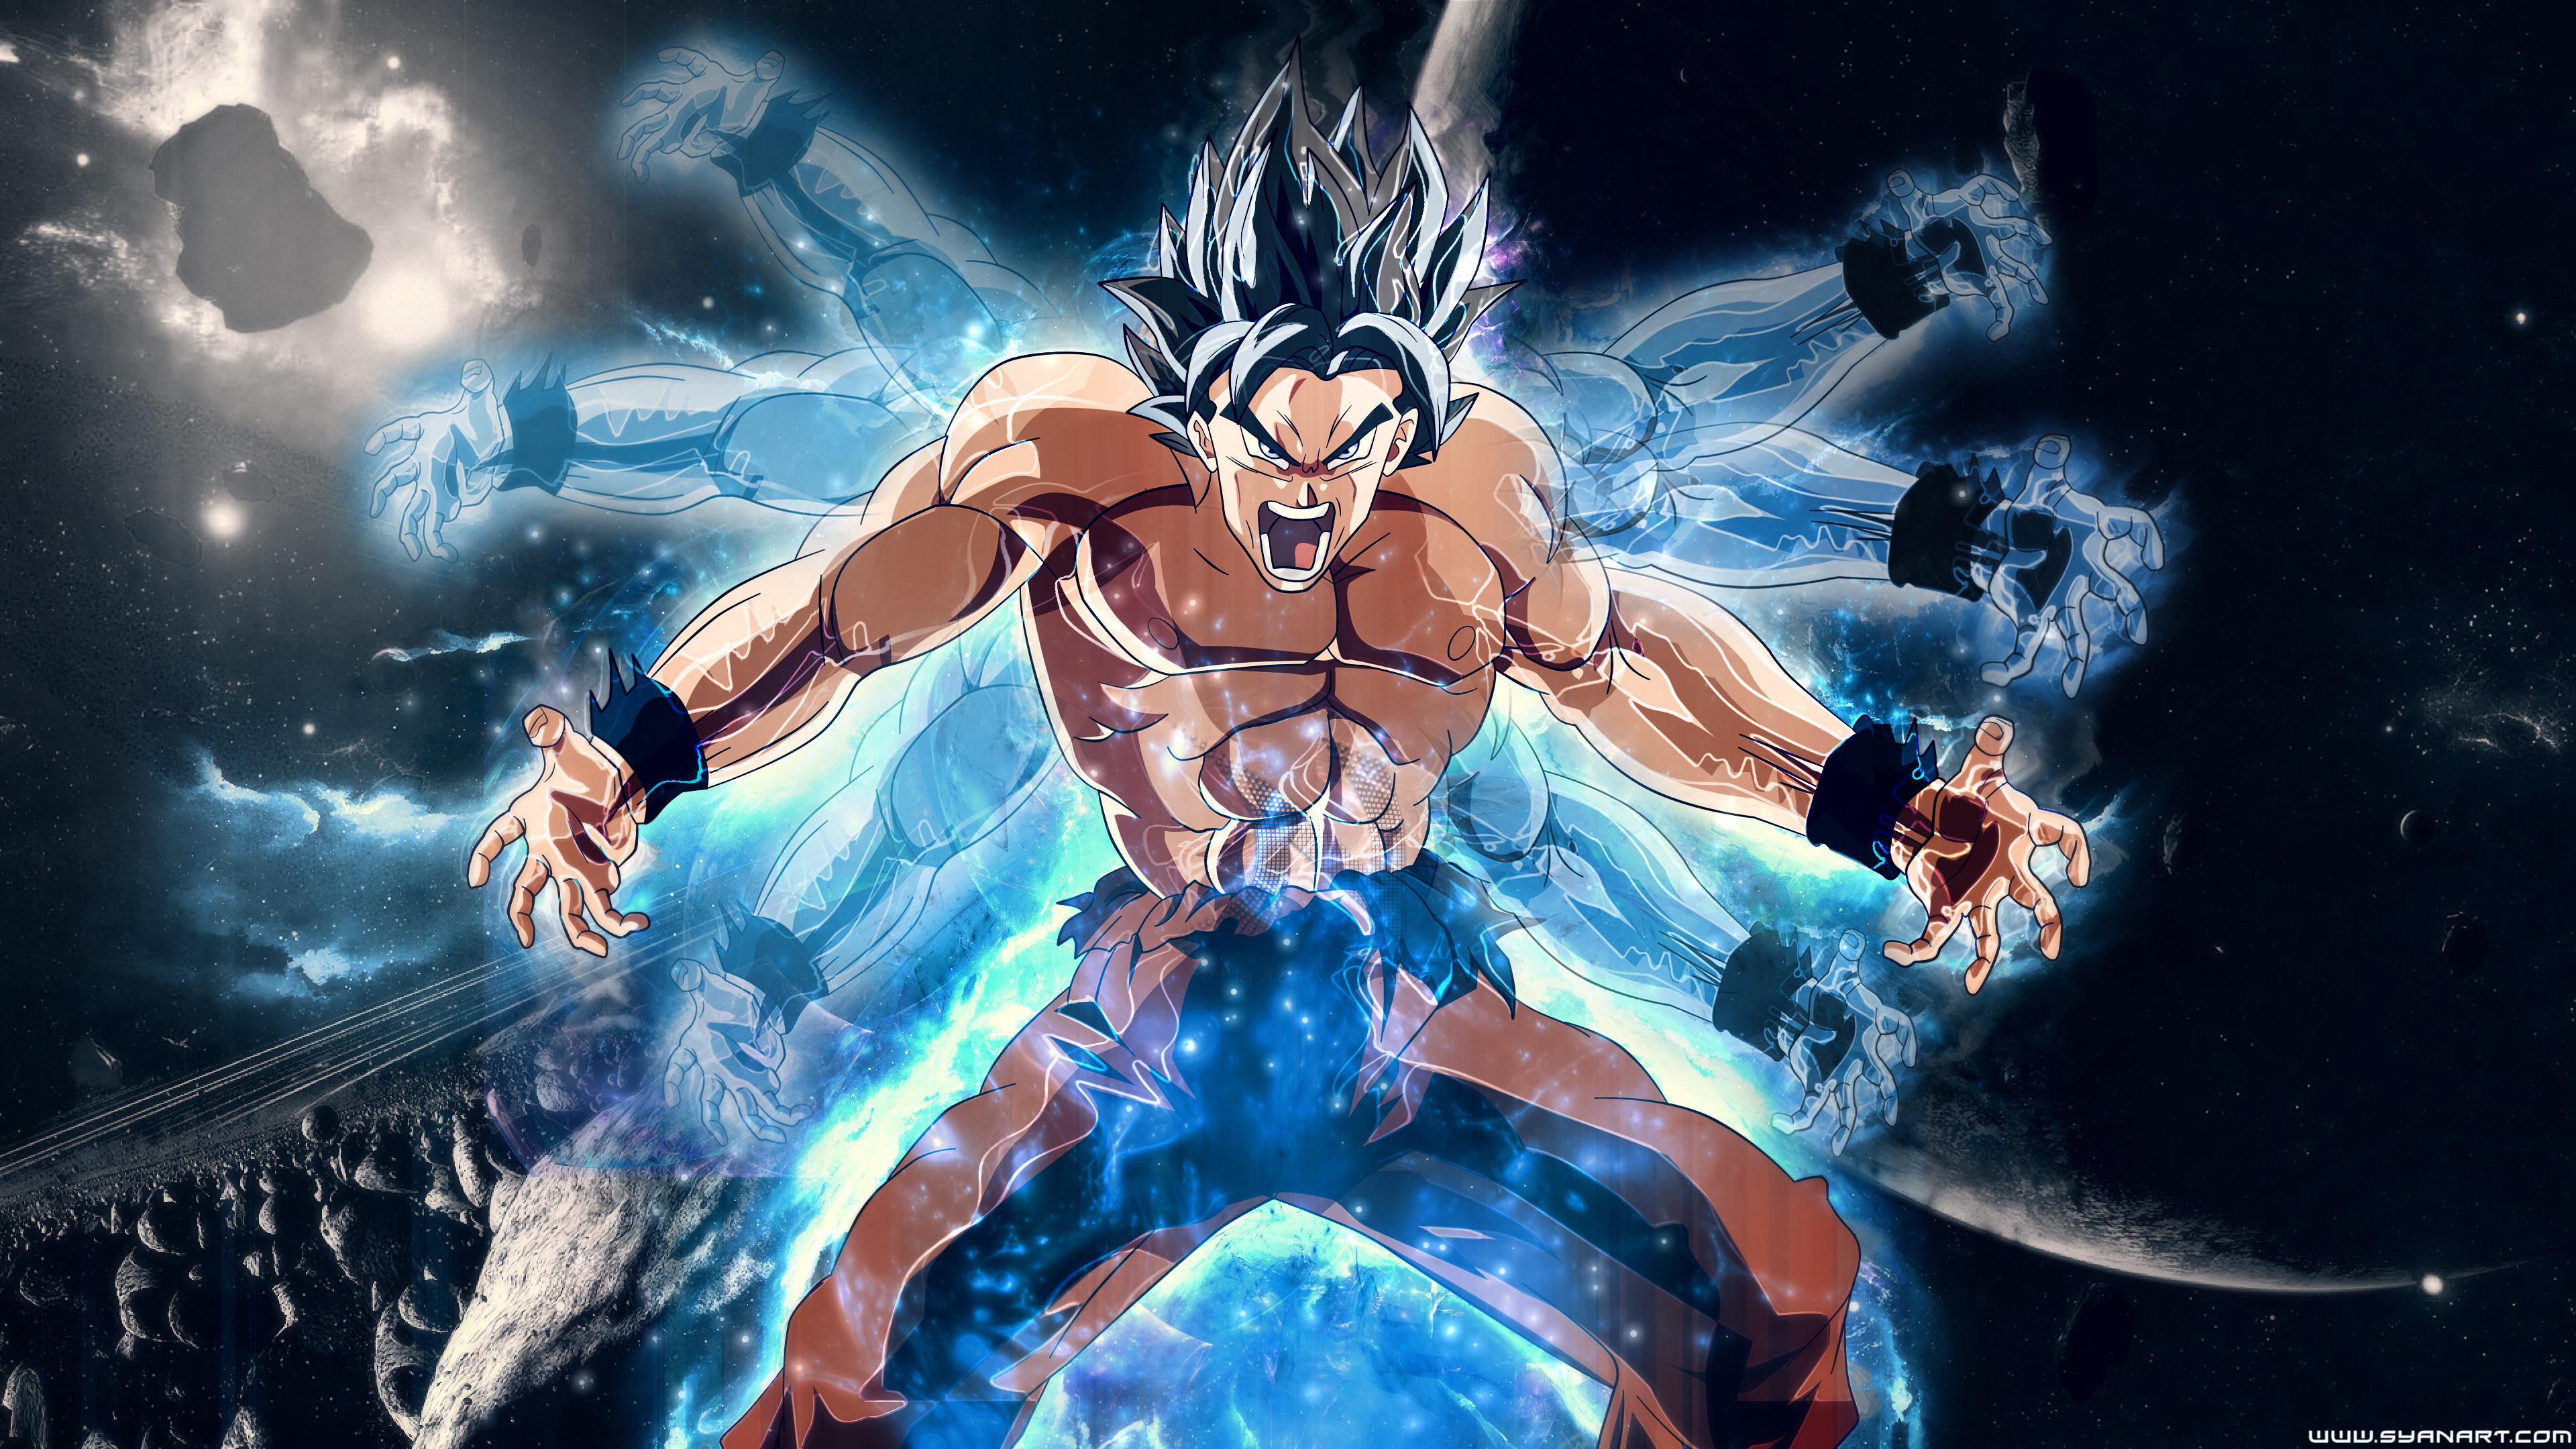 Dragon Ball Z Super Wallpaper Hd Gambarku